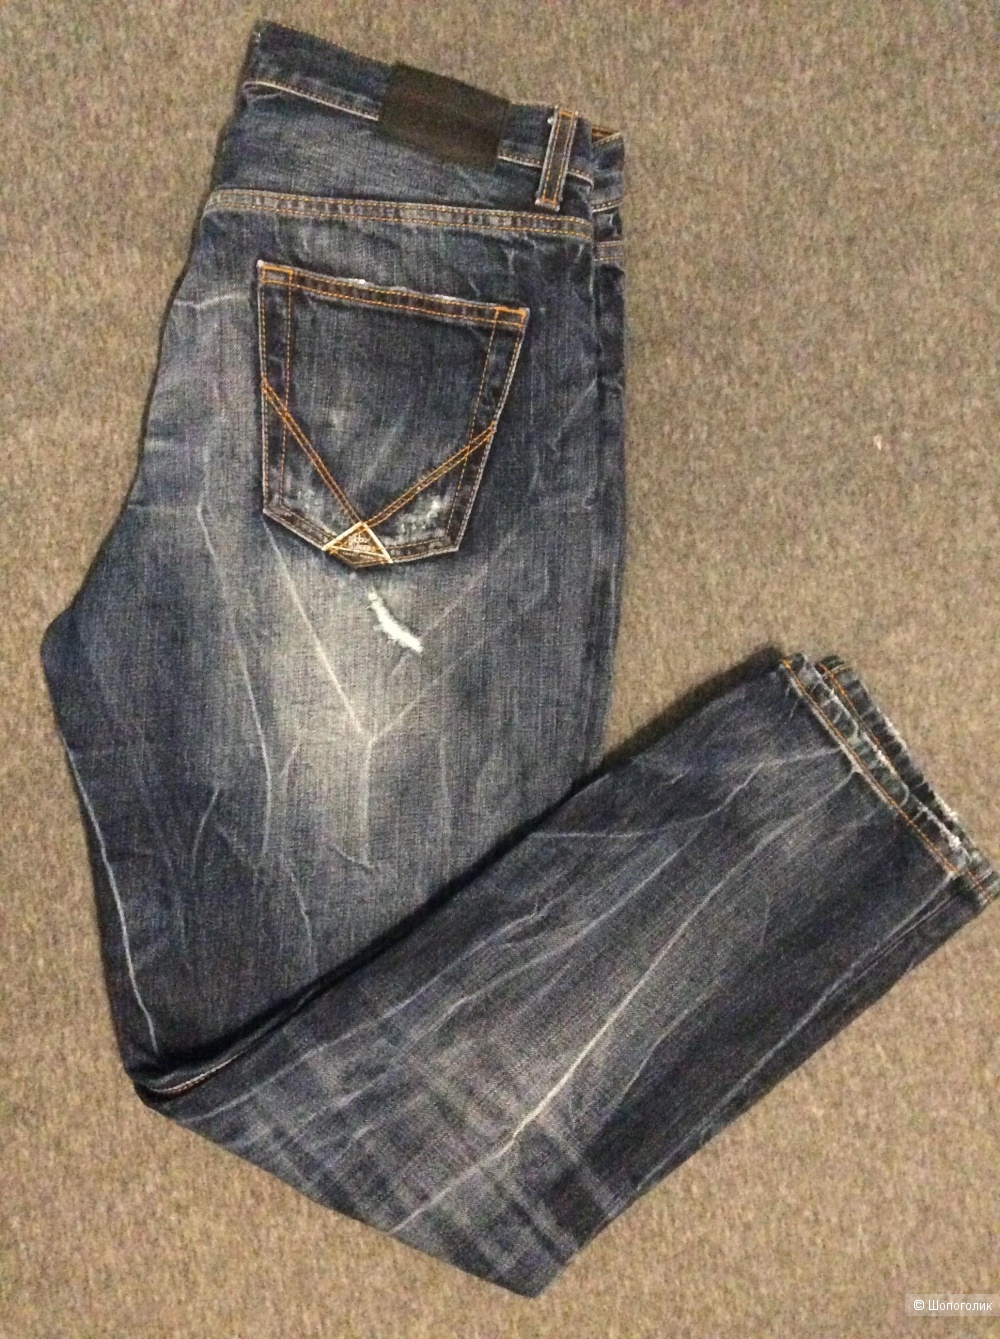 ROŸ ROGER'S Джинсовые брюки, размер 30